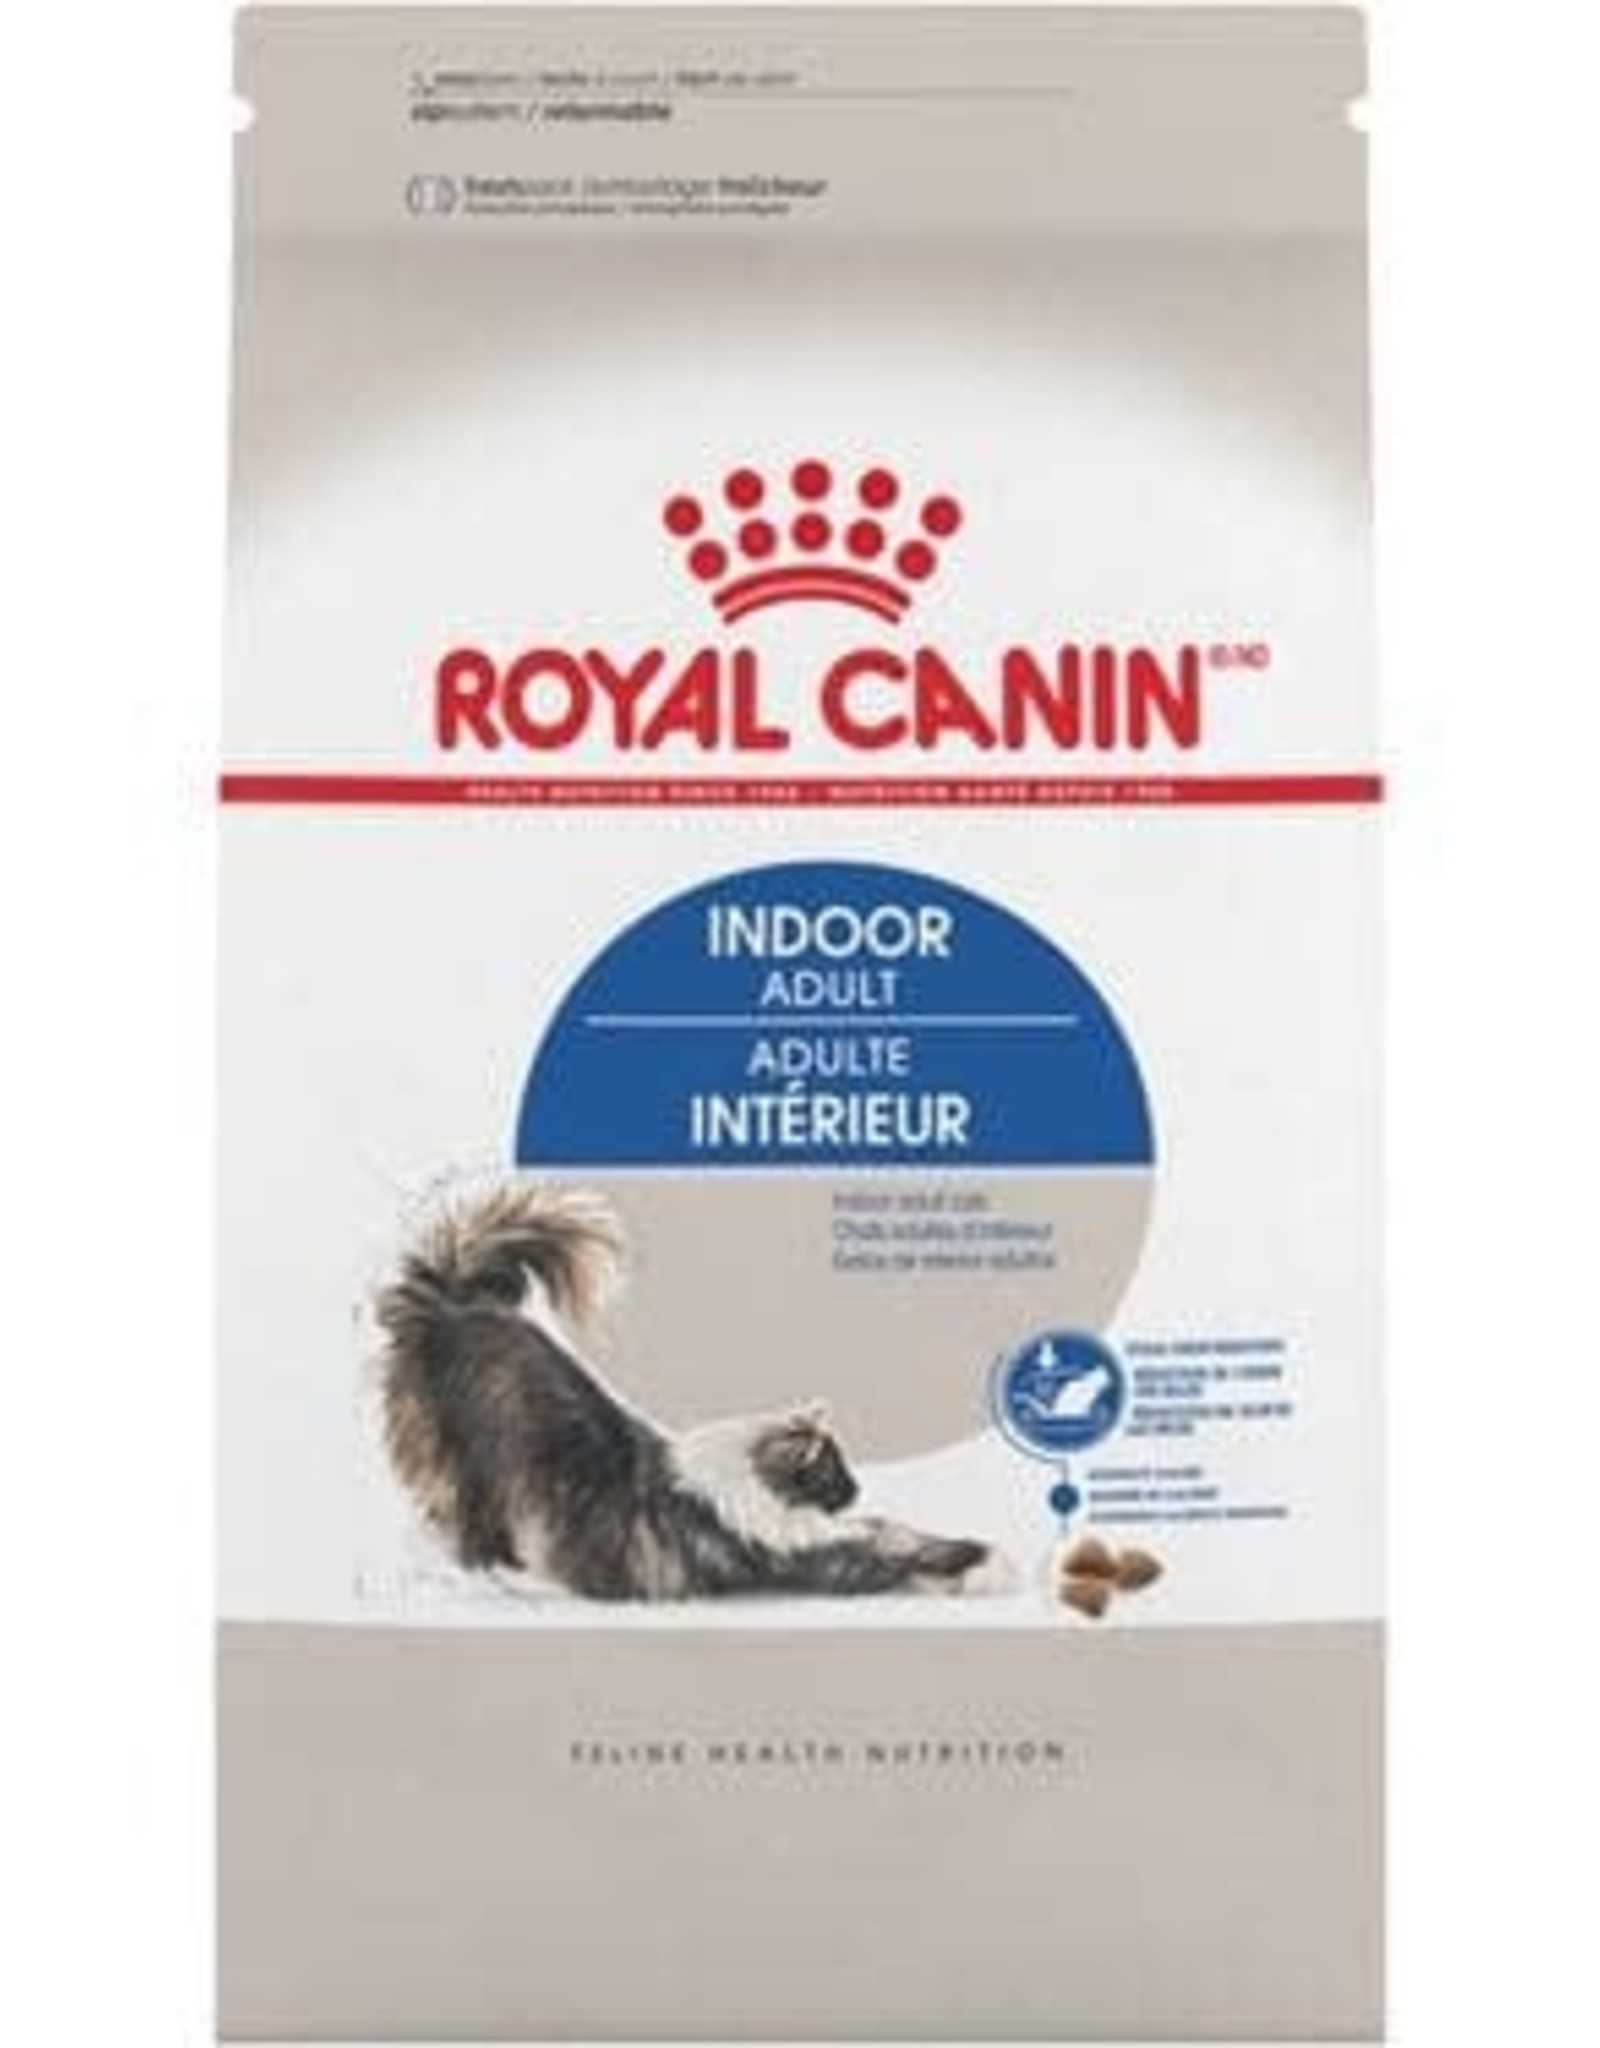 Royal Canin Royal Canin Indoor Cat 7lb